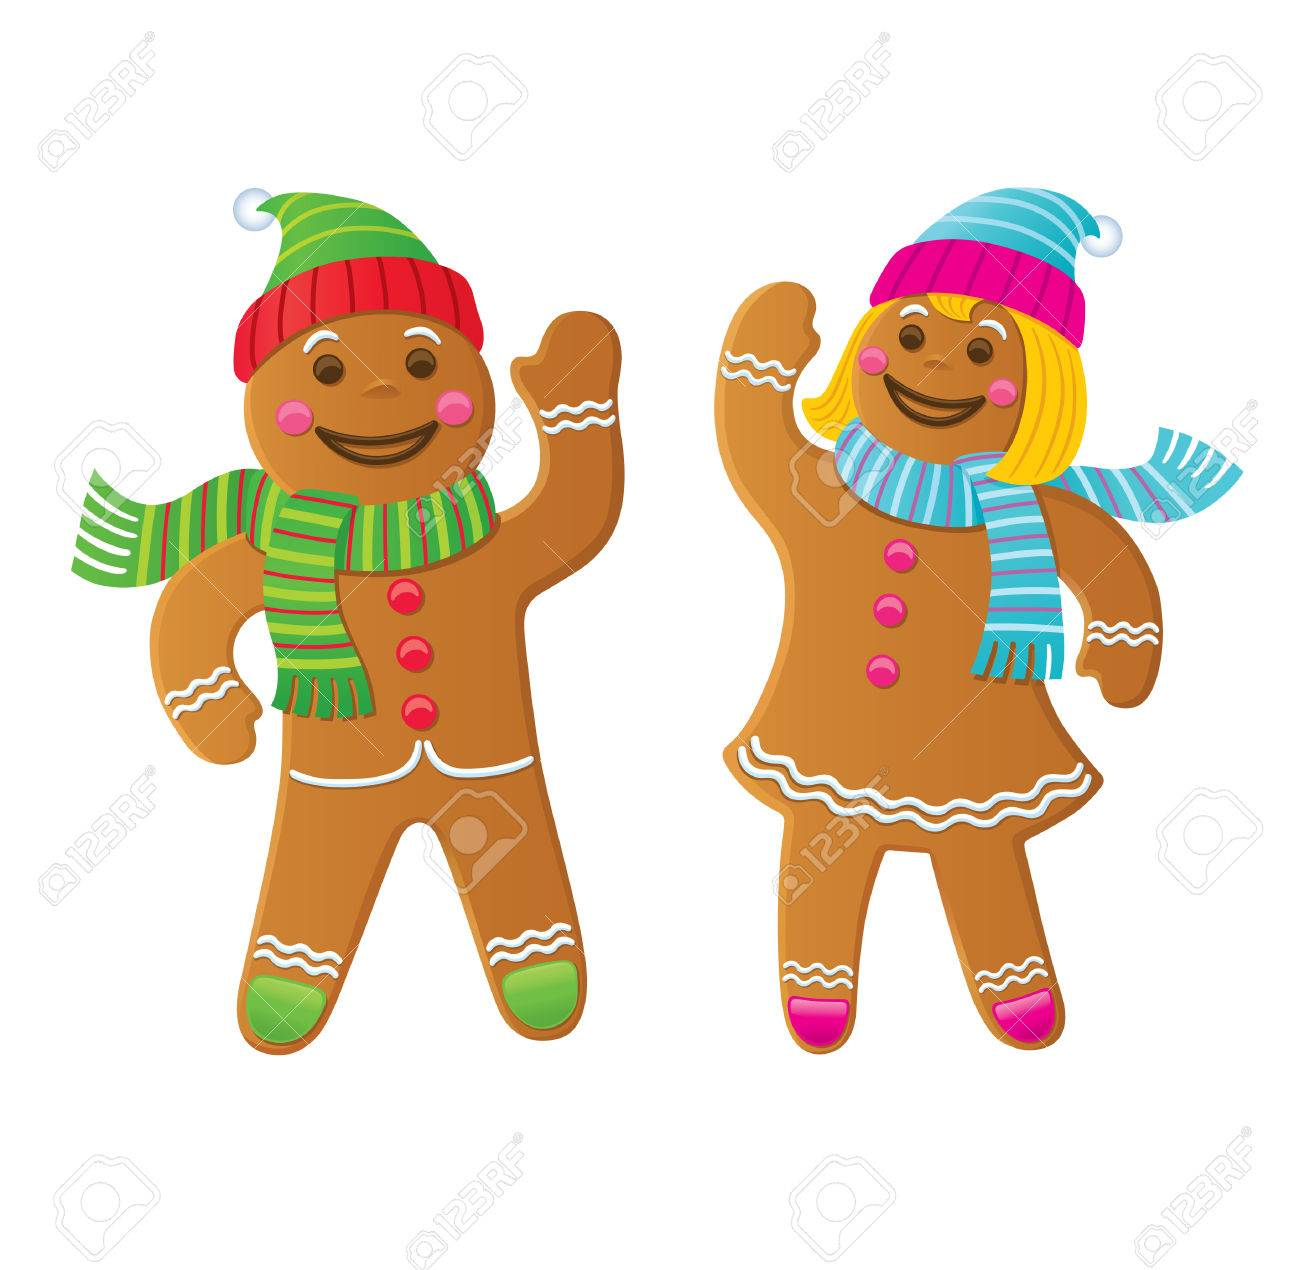 Gingerbread Boy and Girl Waving.